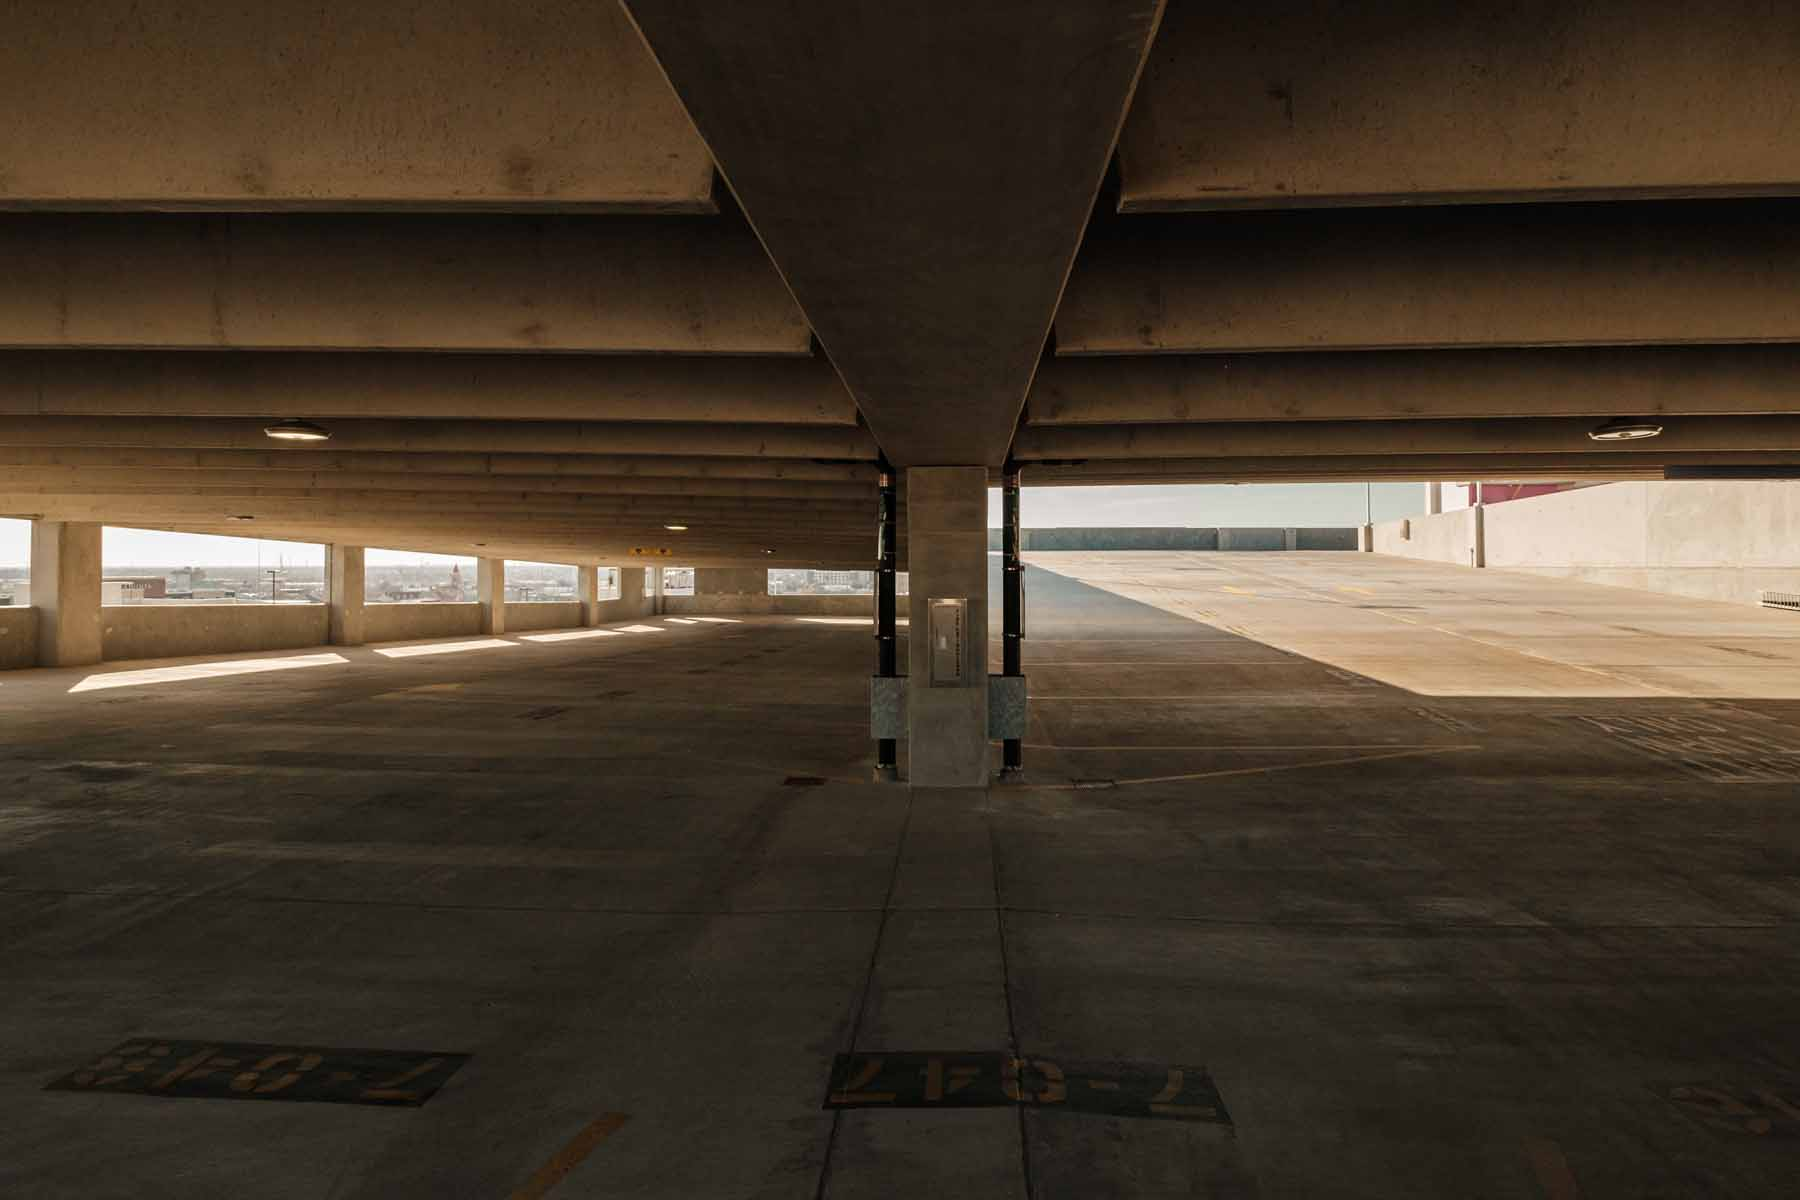 Bexar County Nueva Parking Garage Joeris